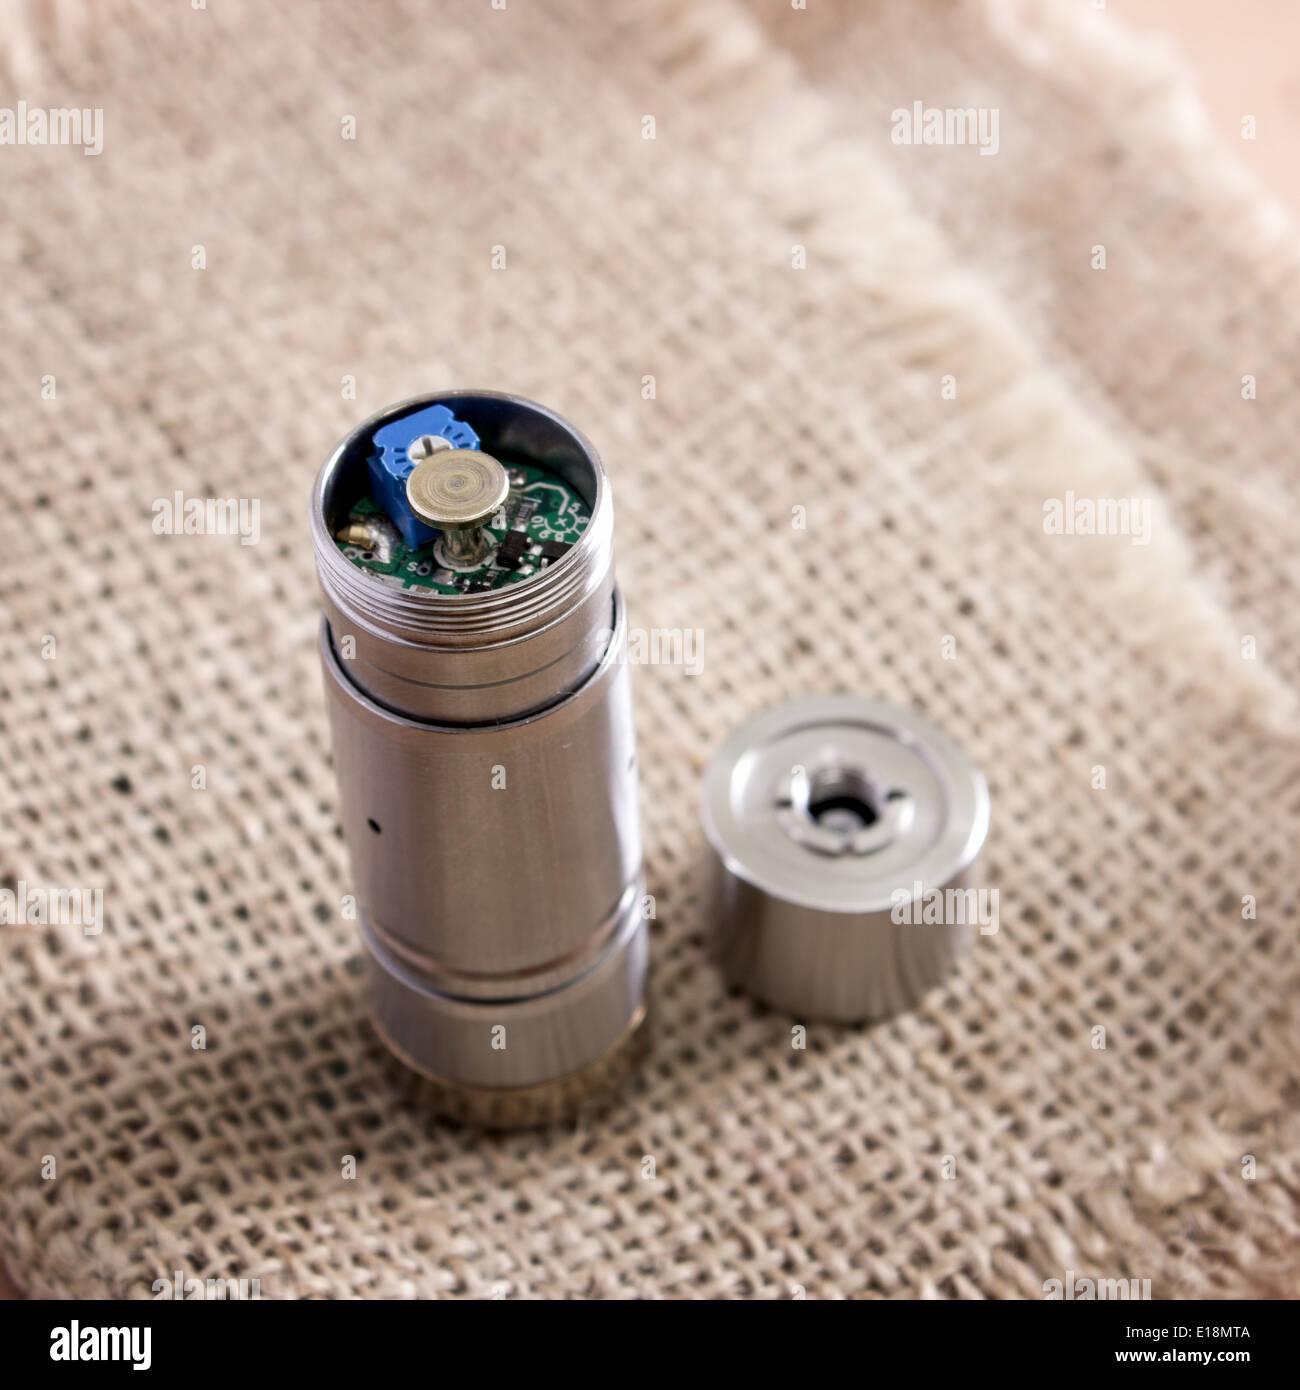 advanced vaping device, e-cigarette on table - Stock Image